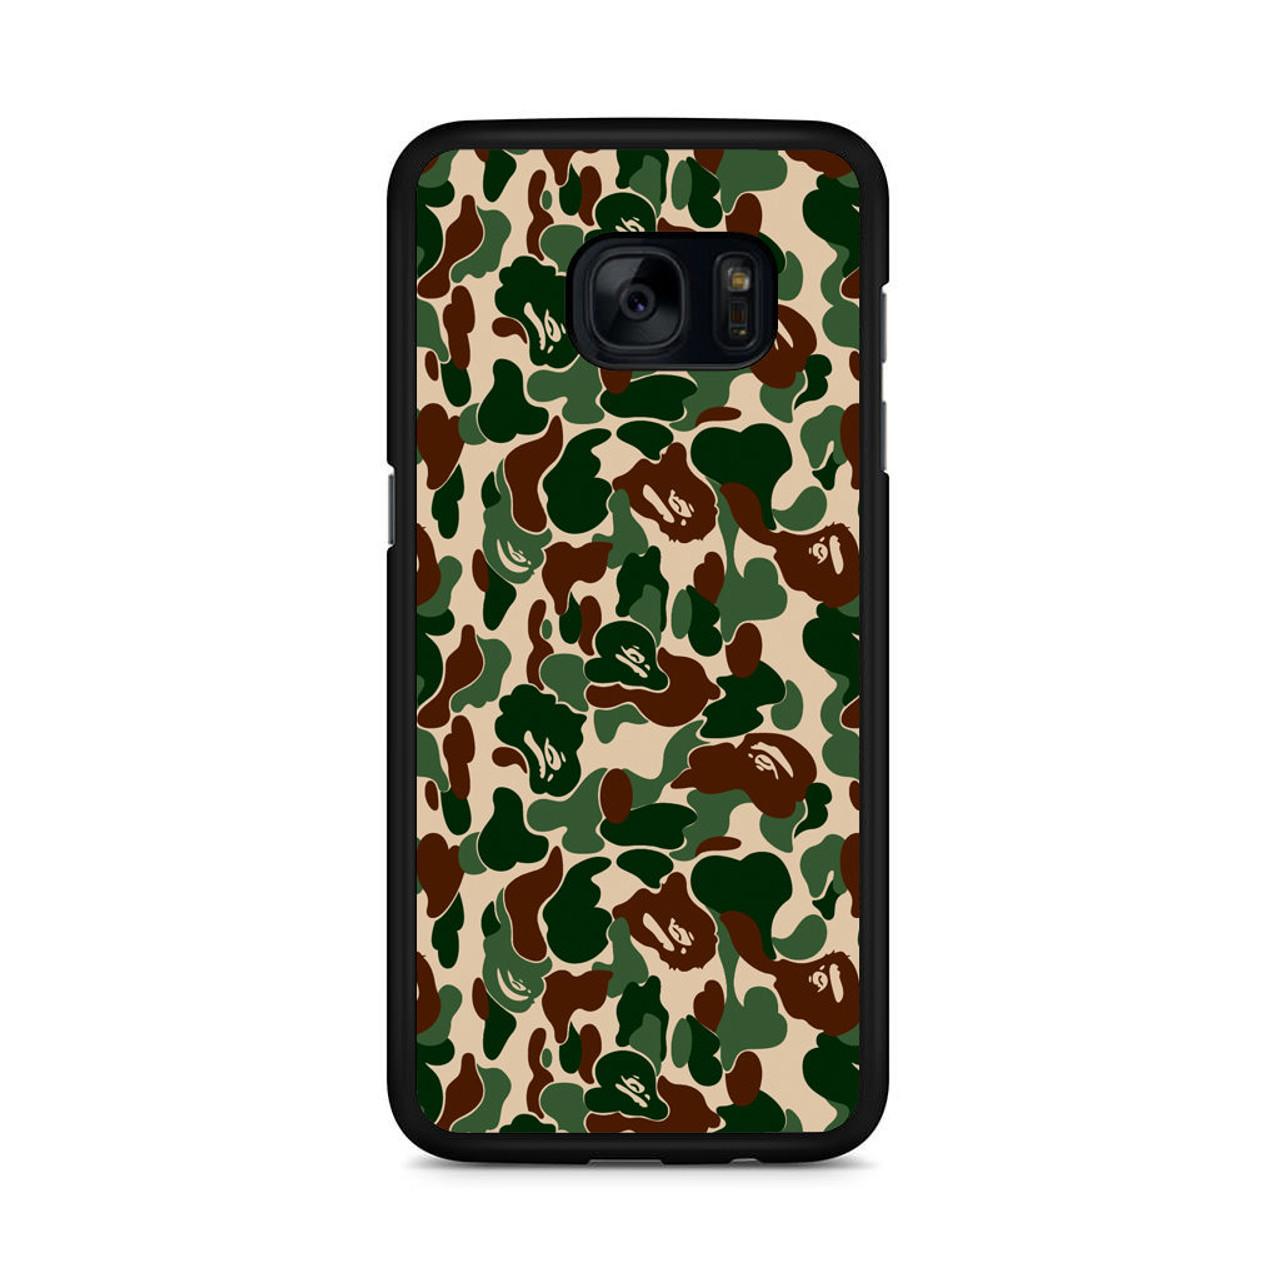 superior quality f3c75 ccaf4 Bathing Ape Bape Camo Real Tree Samsung Galaxy S7 Edge Case